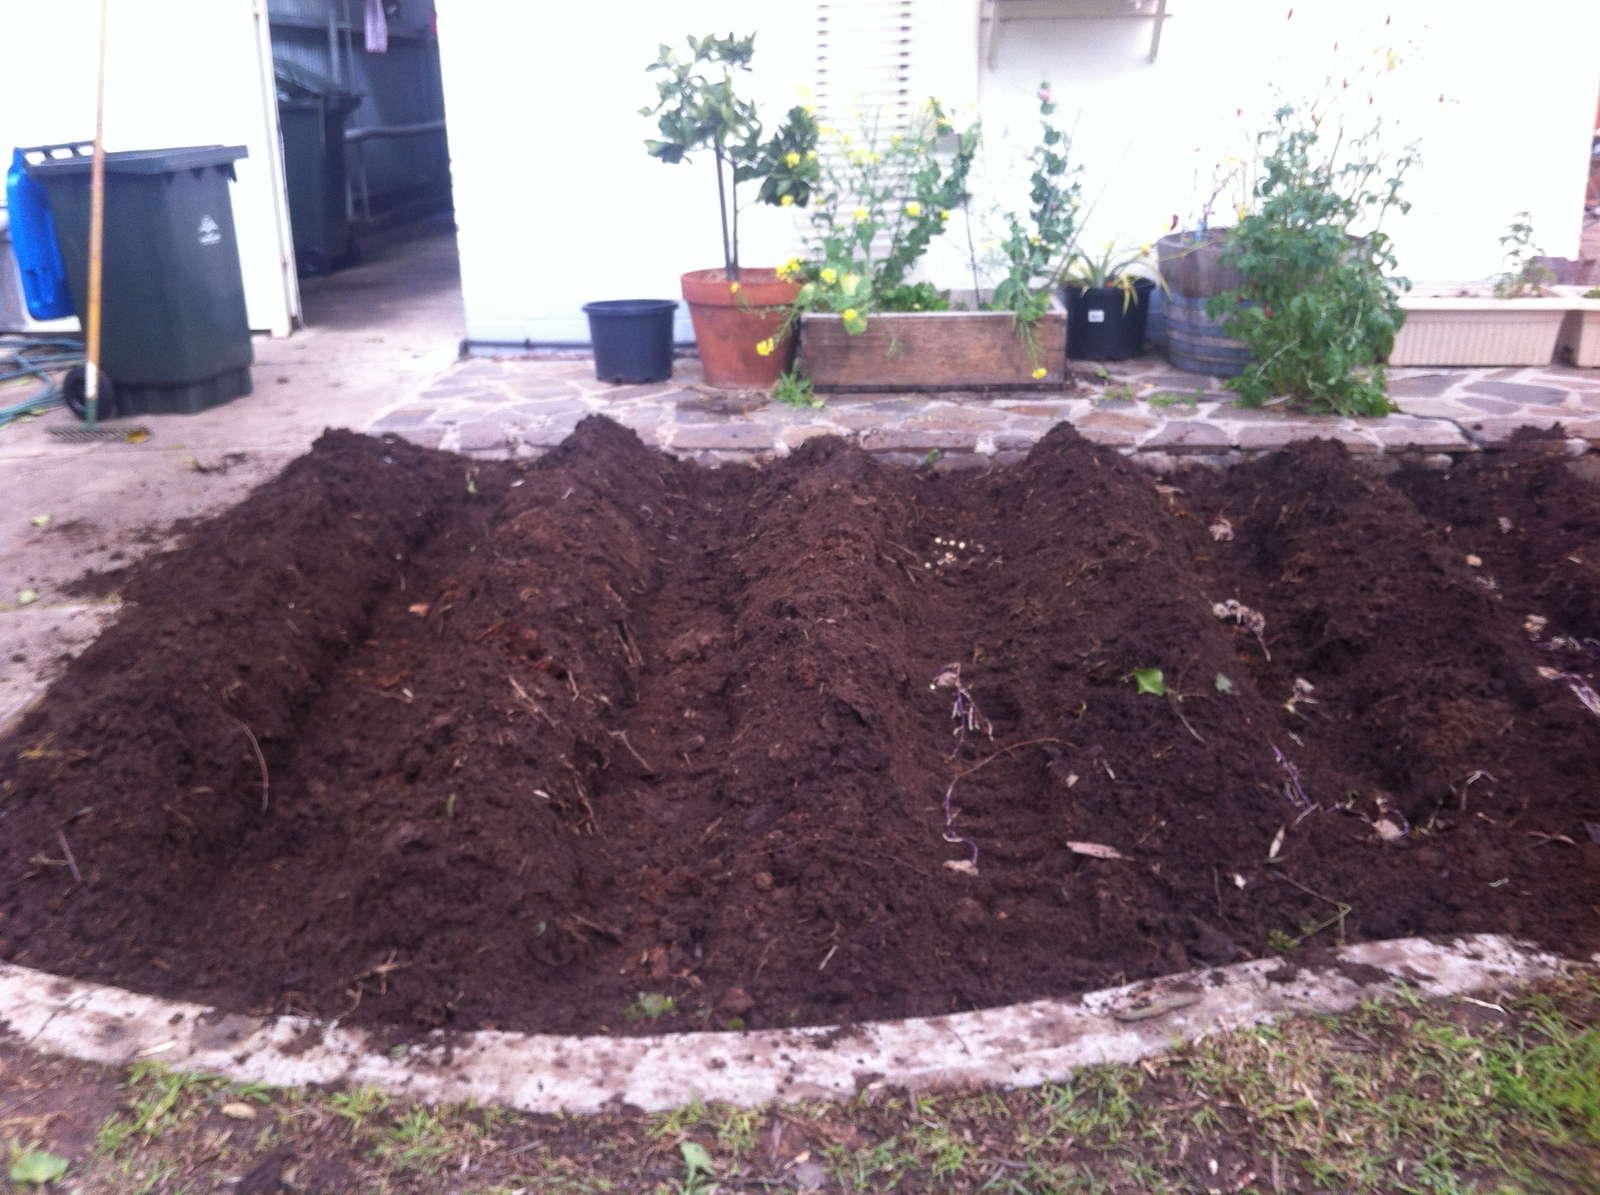 kartoffeln pflanzen erd pfel selber anbauen plantura. Black Bedroom Furniture Sets. Home Design Ideas